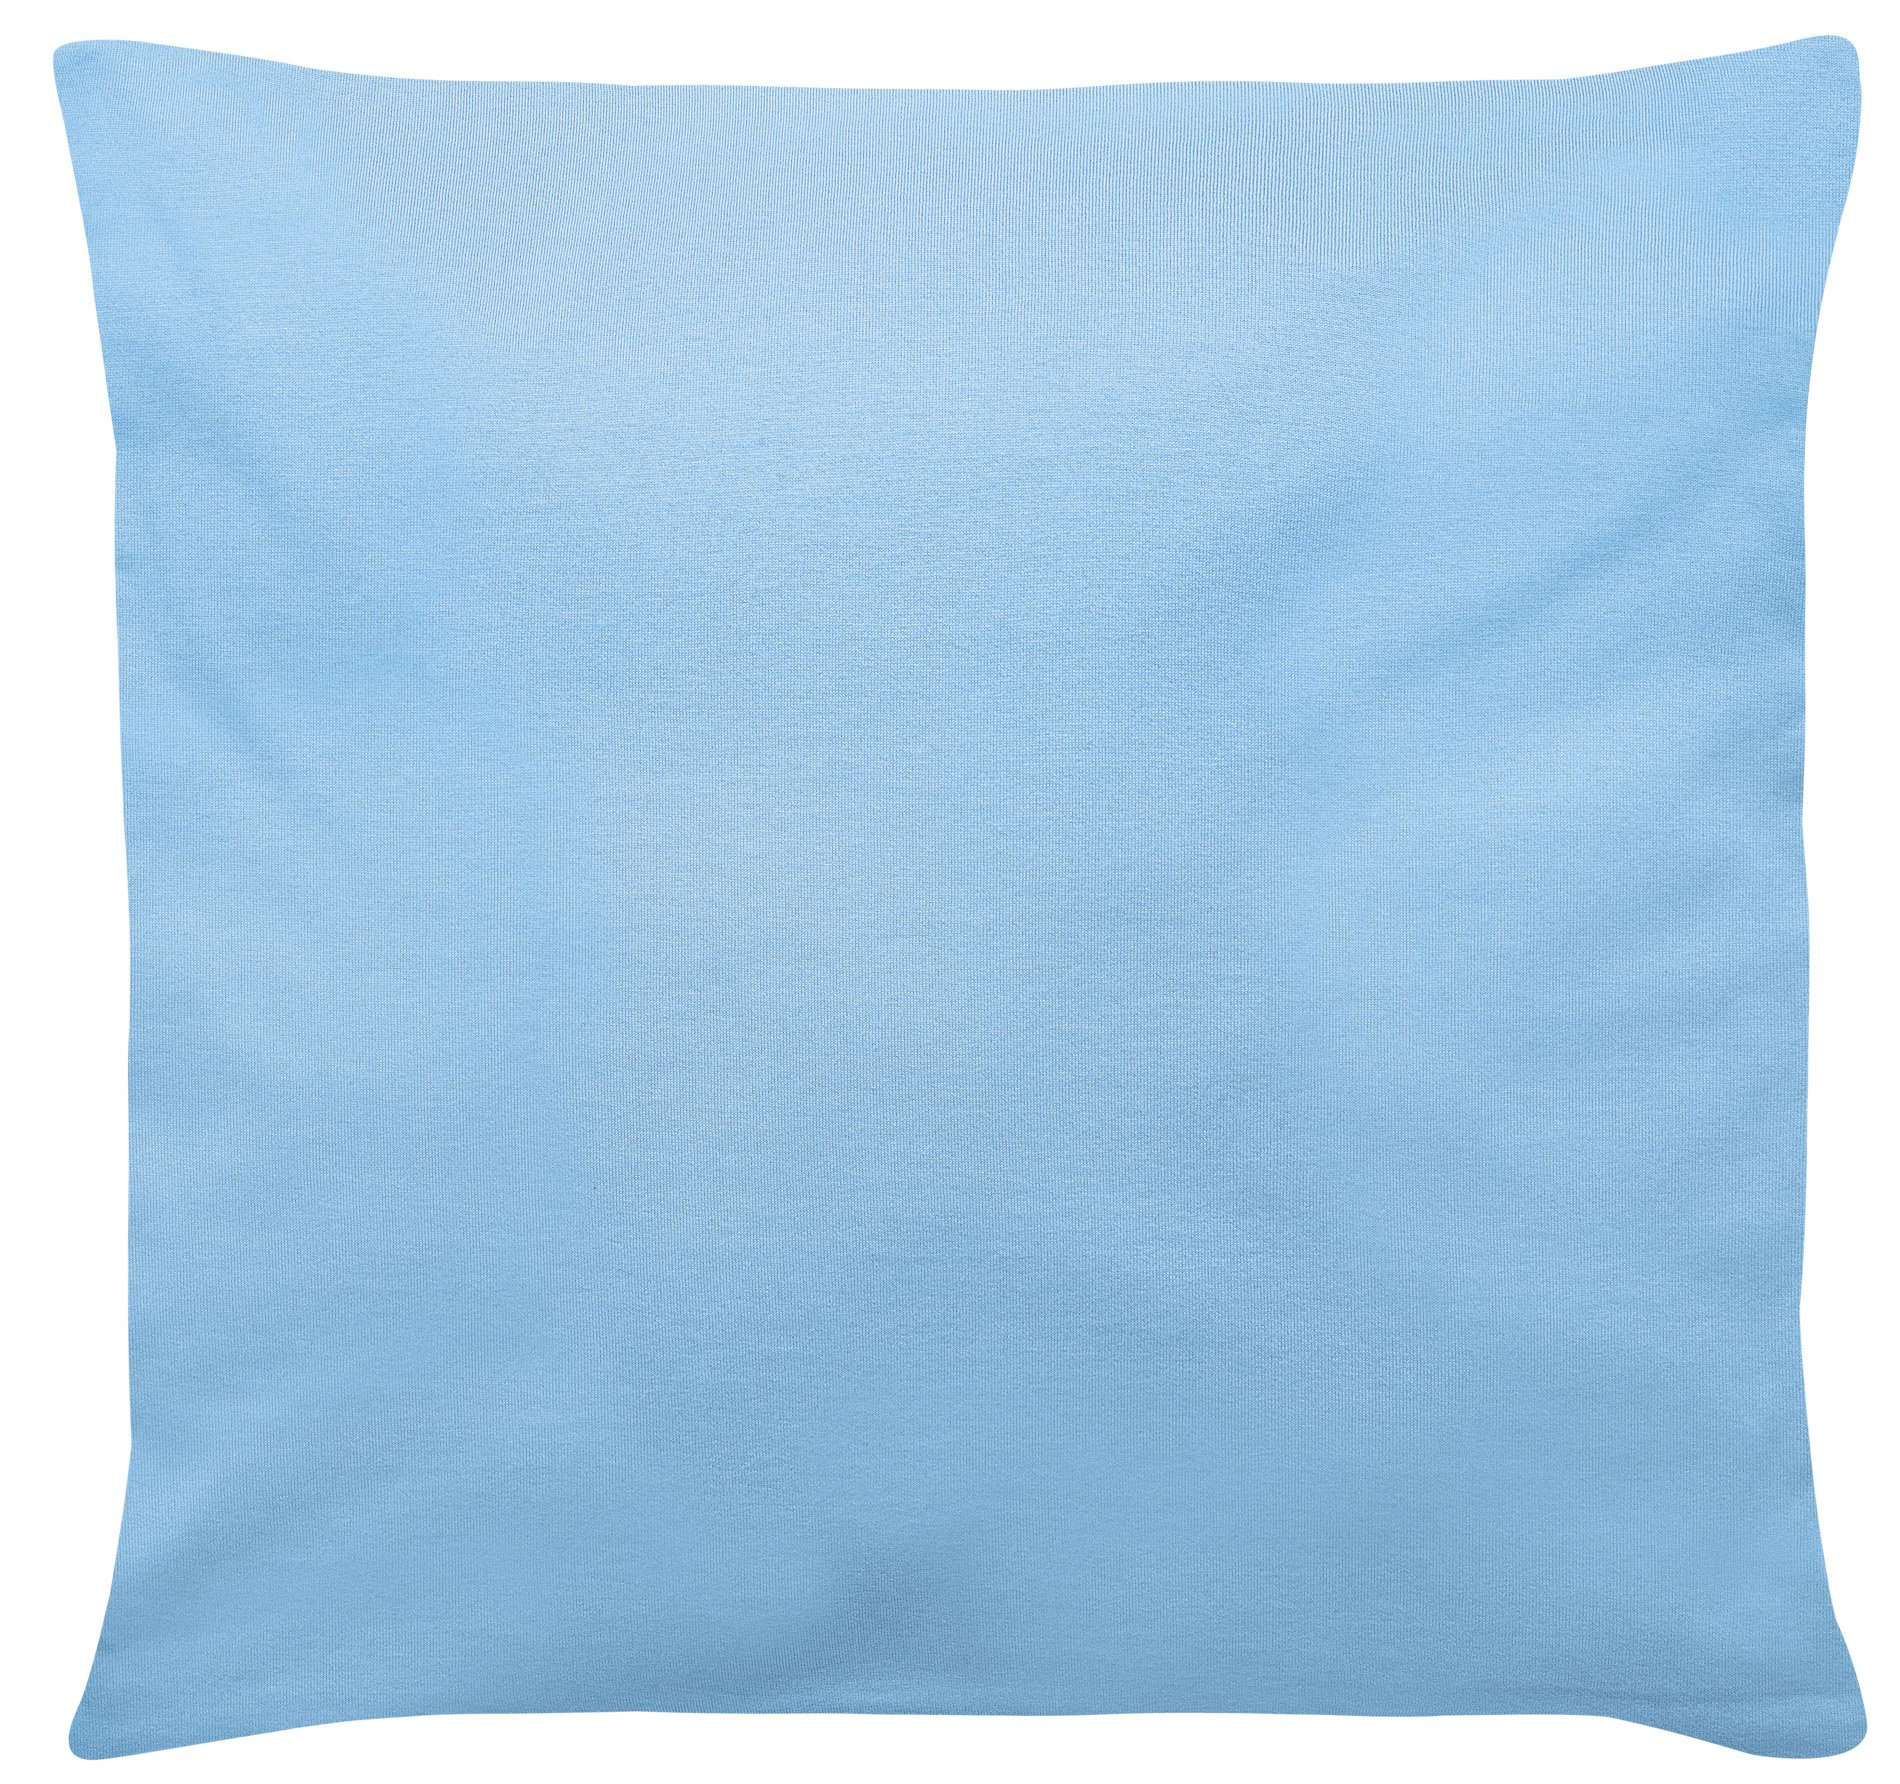 K.-Bezug hellblau 40x40cm